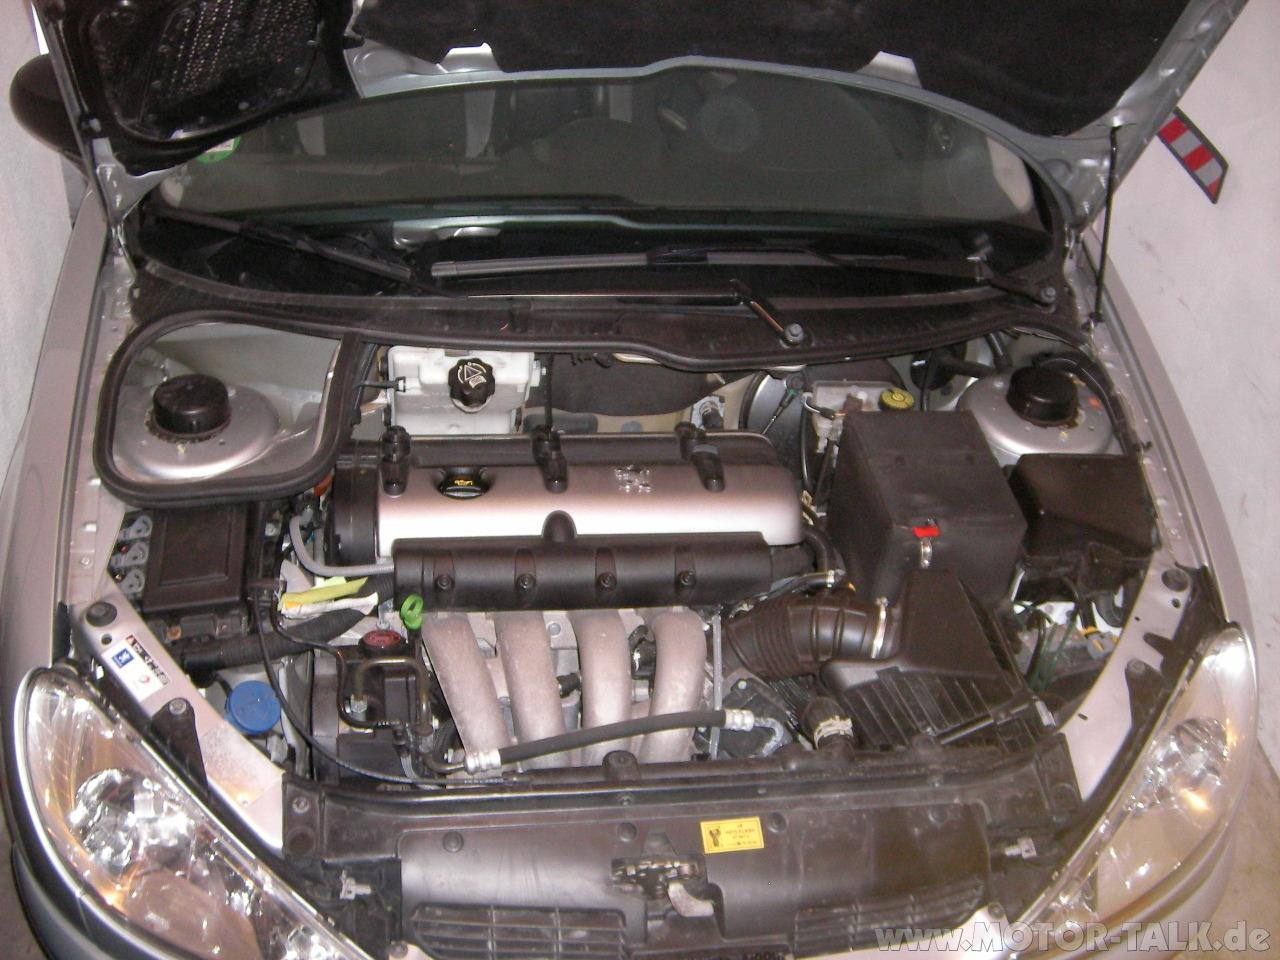 Motorraum Peugeot 206 2 0 Rc Rfk Test Testberichte